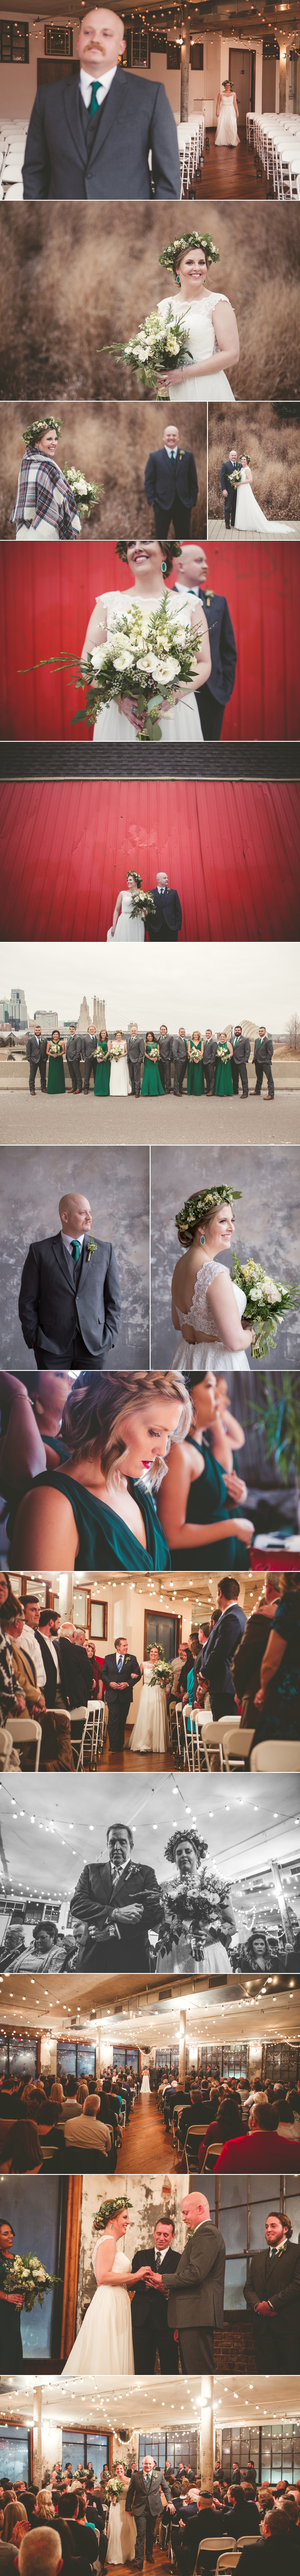 jason_domingues_photography_best_kansas_city_wedding_photographer_kc_weddings_the_bauer0002